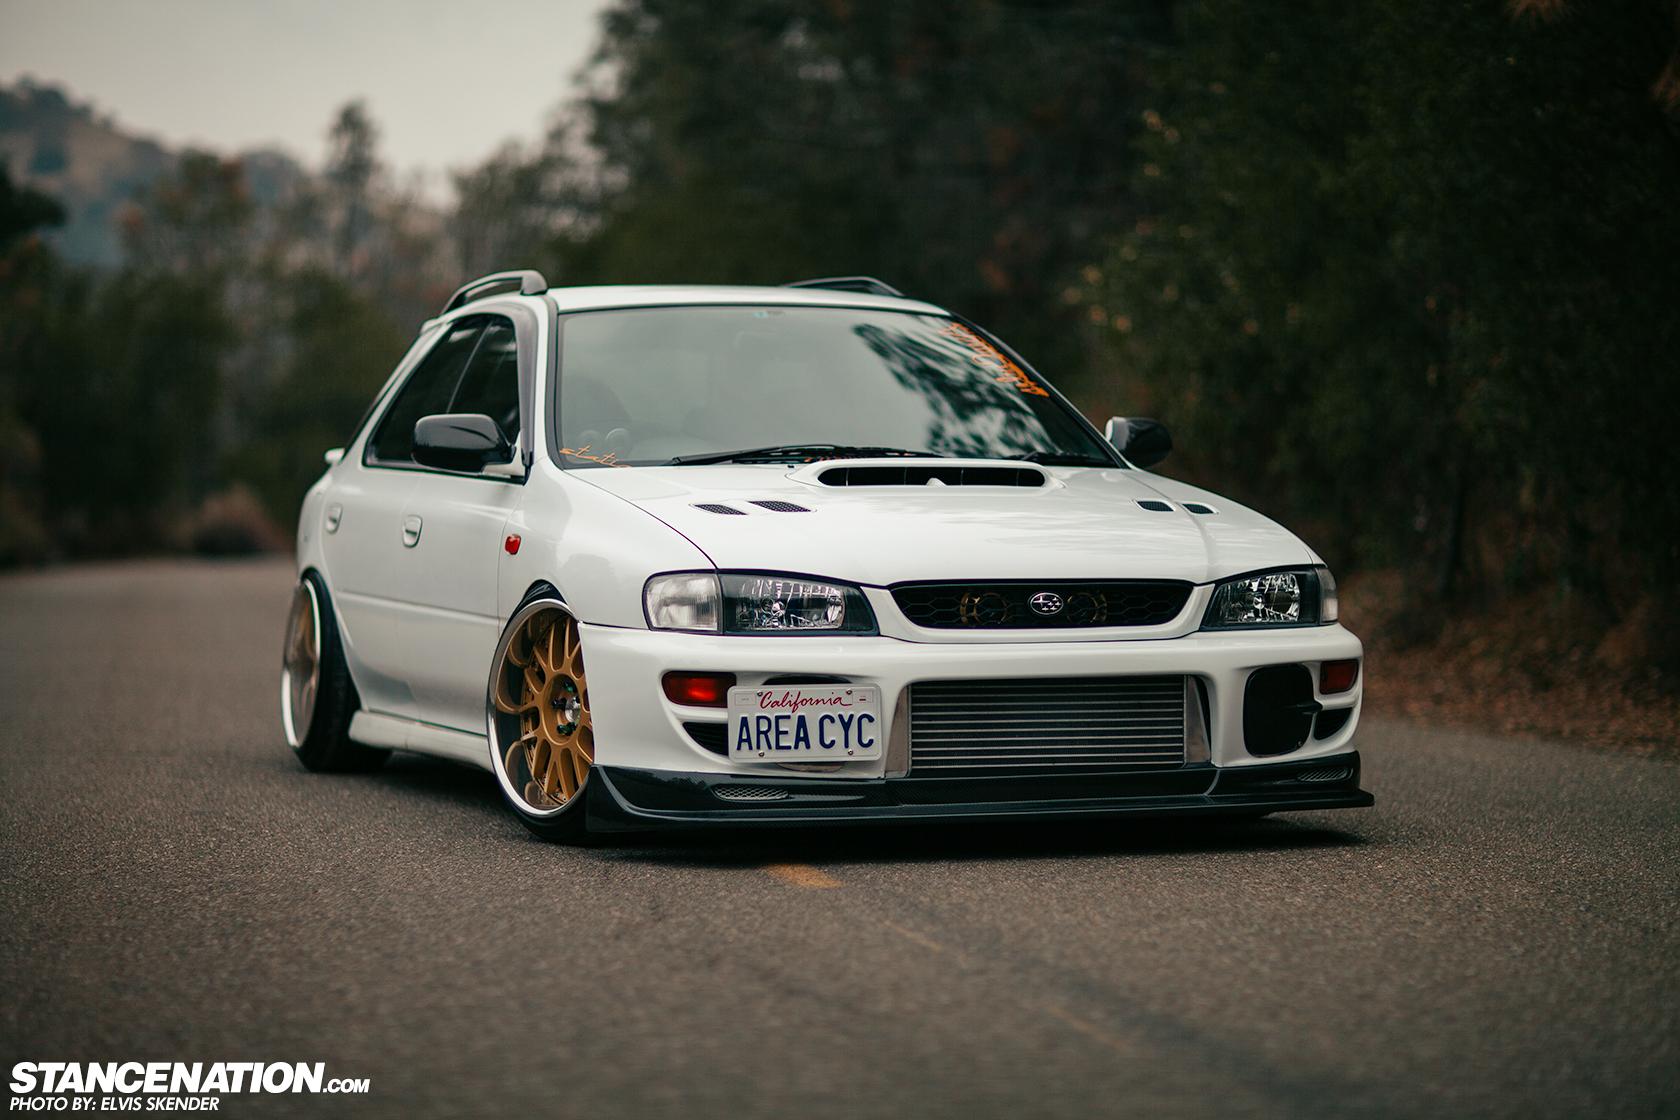 New to the Subaru game. 2003 WRX wagon. |2003 Impreza Wrx Wagon Stanced